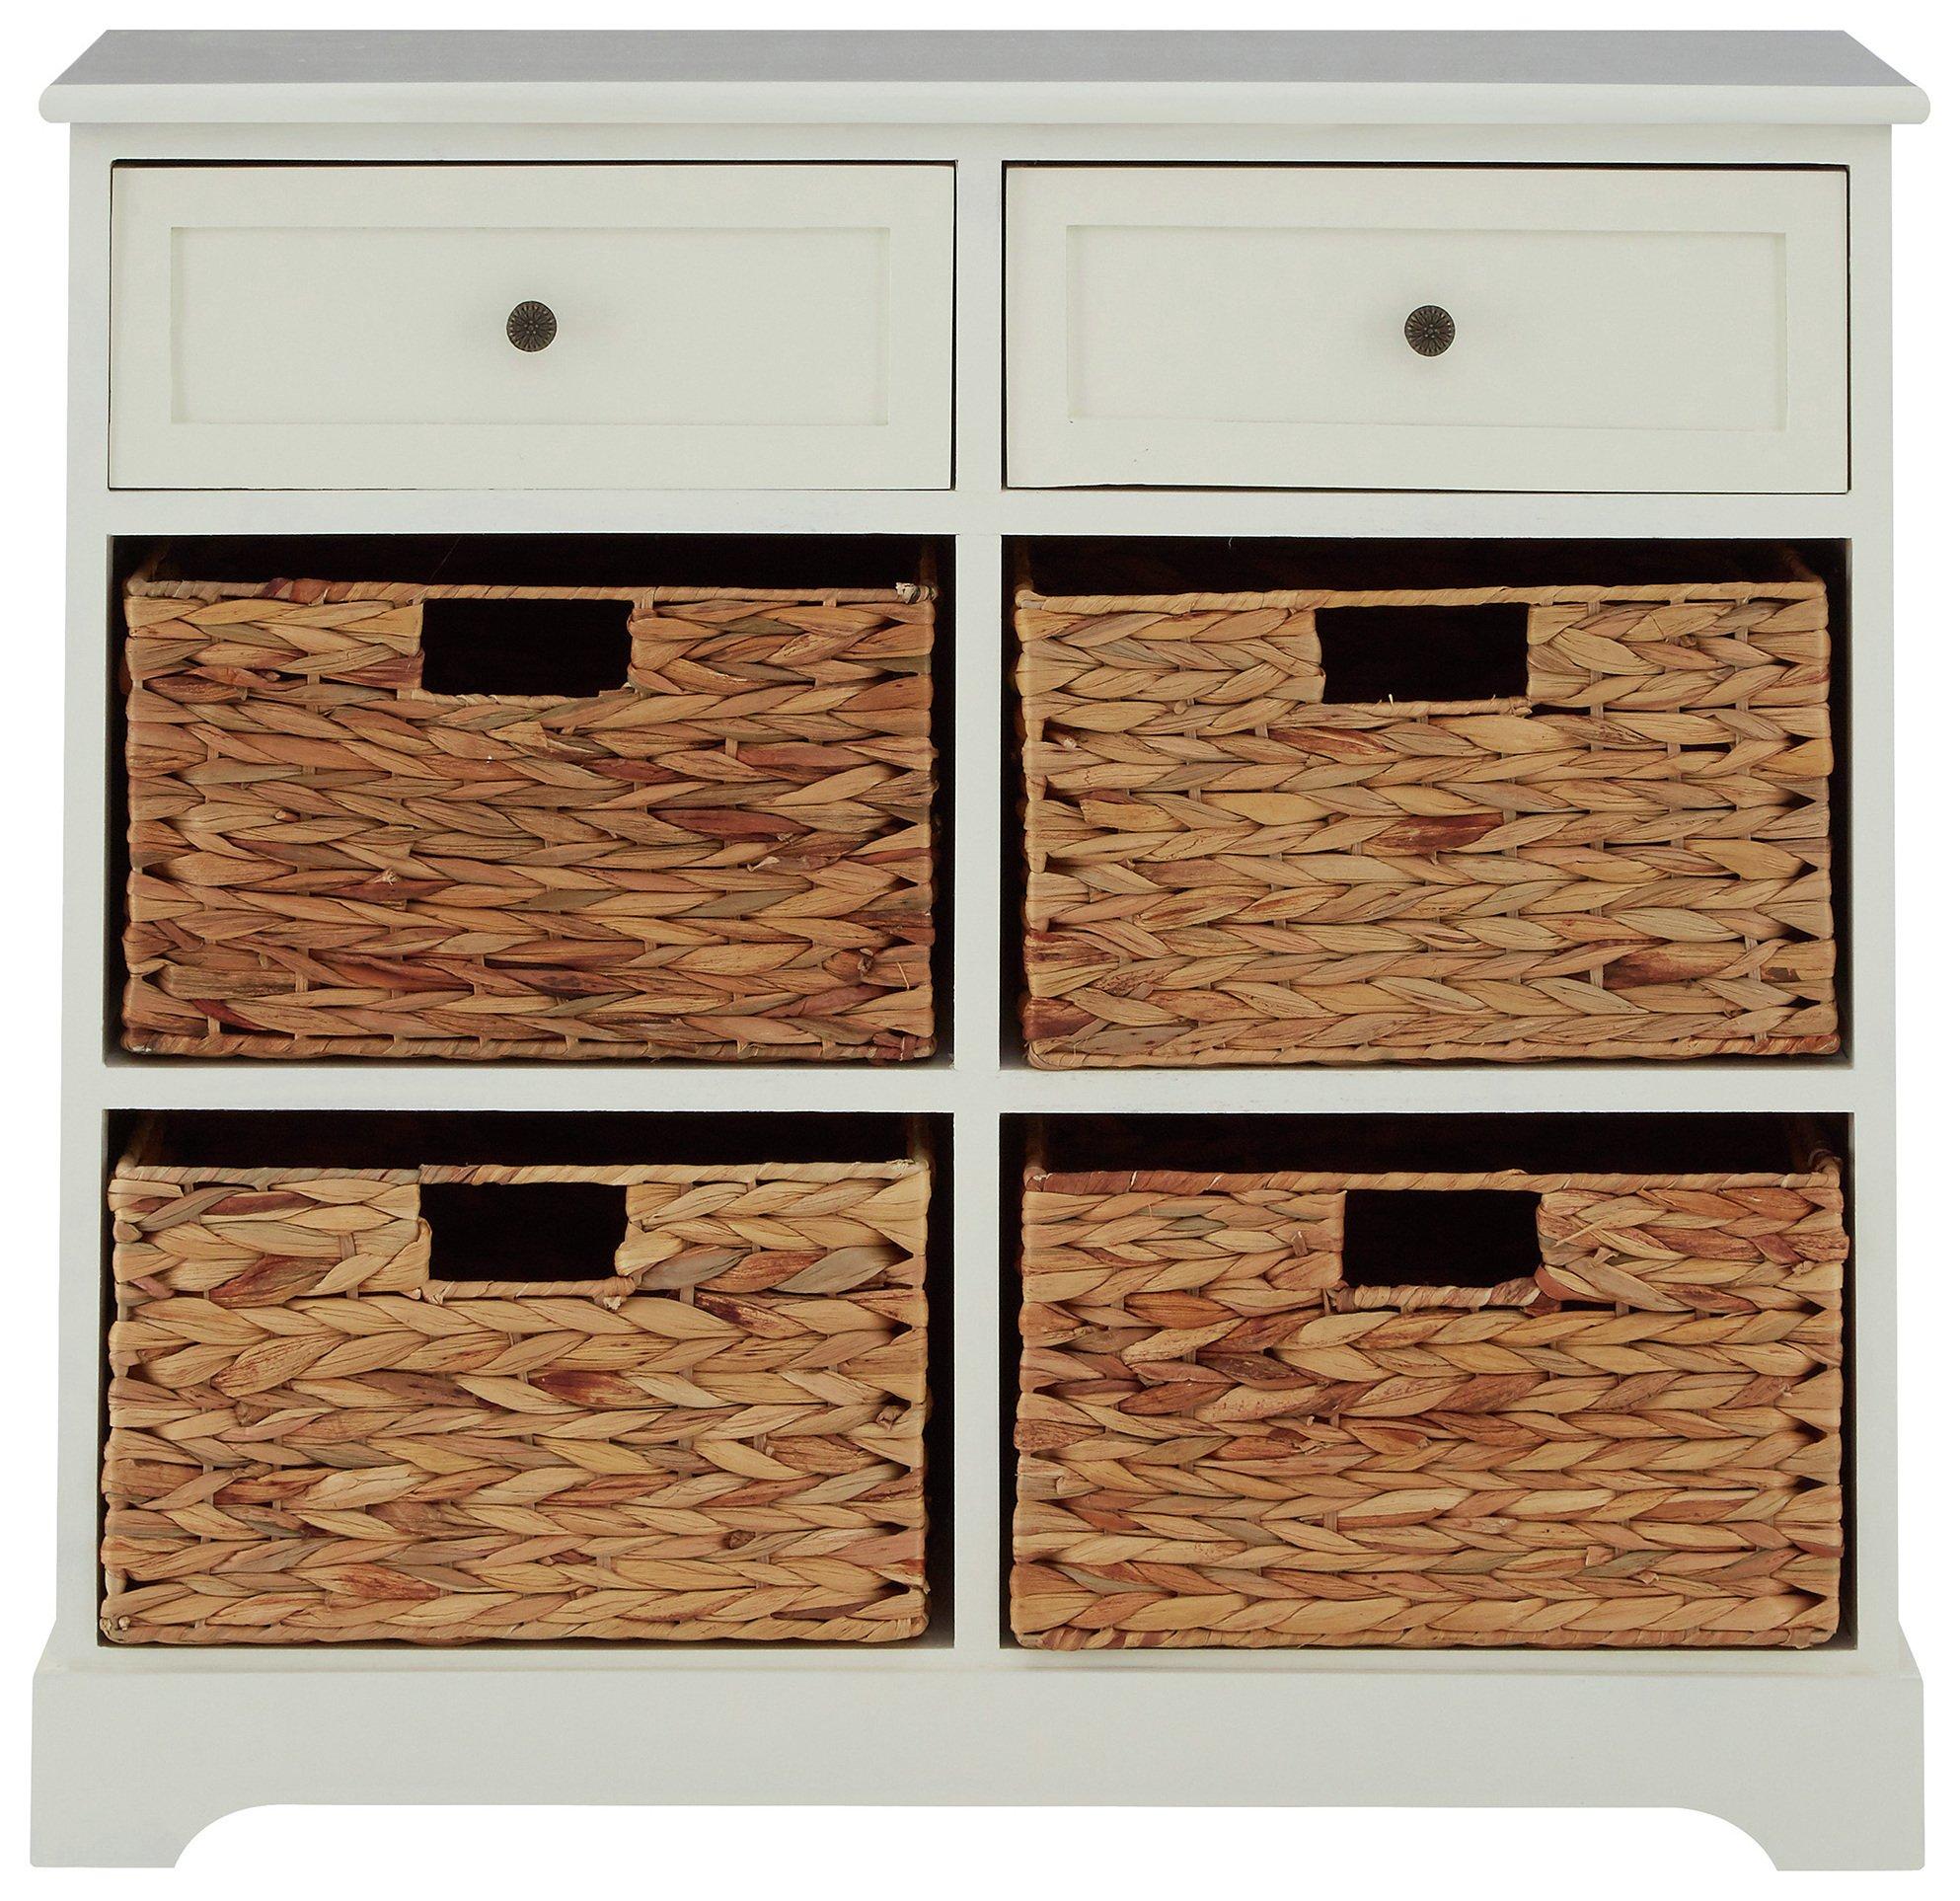 Premier Housewares Vermont 2 Drawer 4 Basket Unit - Ivory.